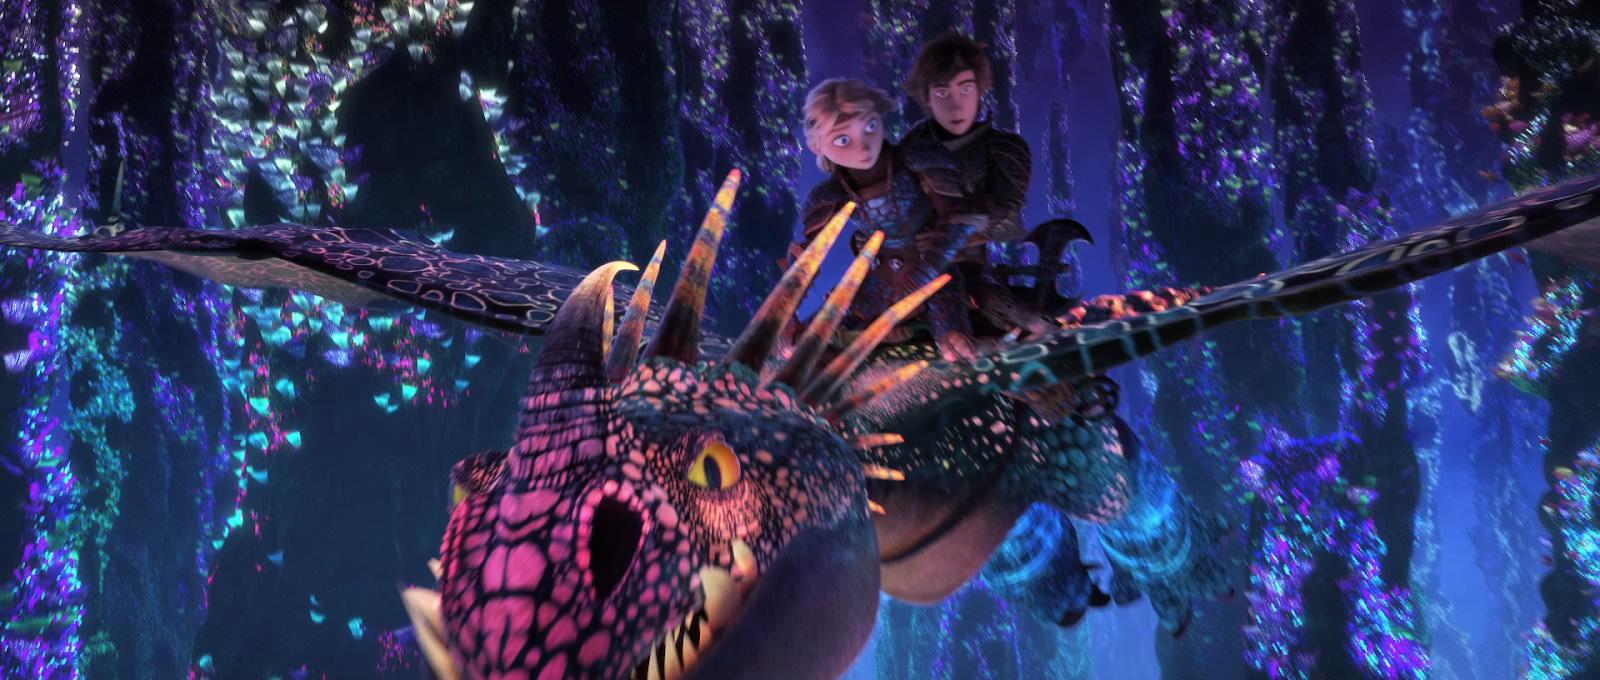 Movie, How to Train Your Dragon: The Hidden World(美國, 2019年) / 馴龍高手3(台灣) /馴龍記3(香港) / 驯龙高手3(中國), 電影角色與配音介紹